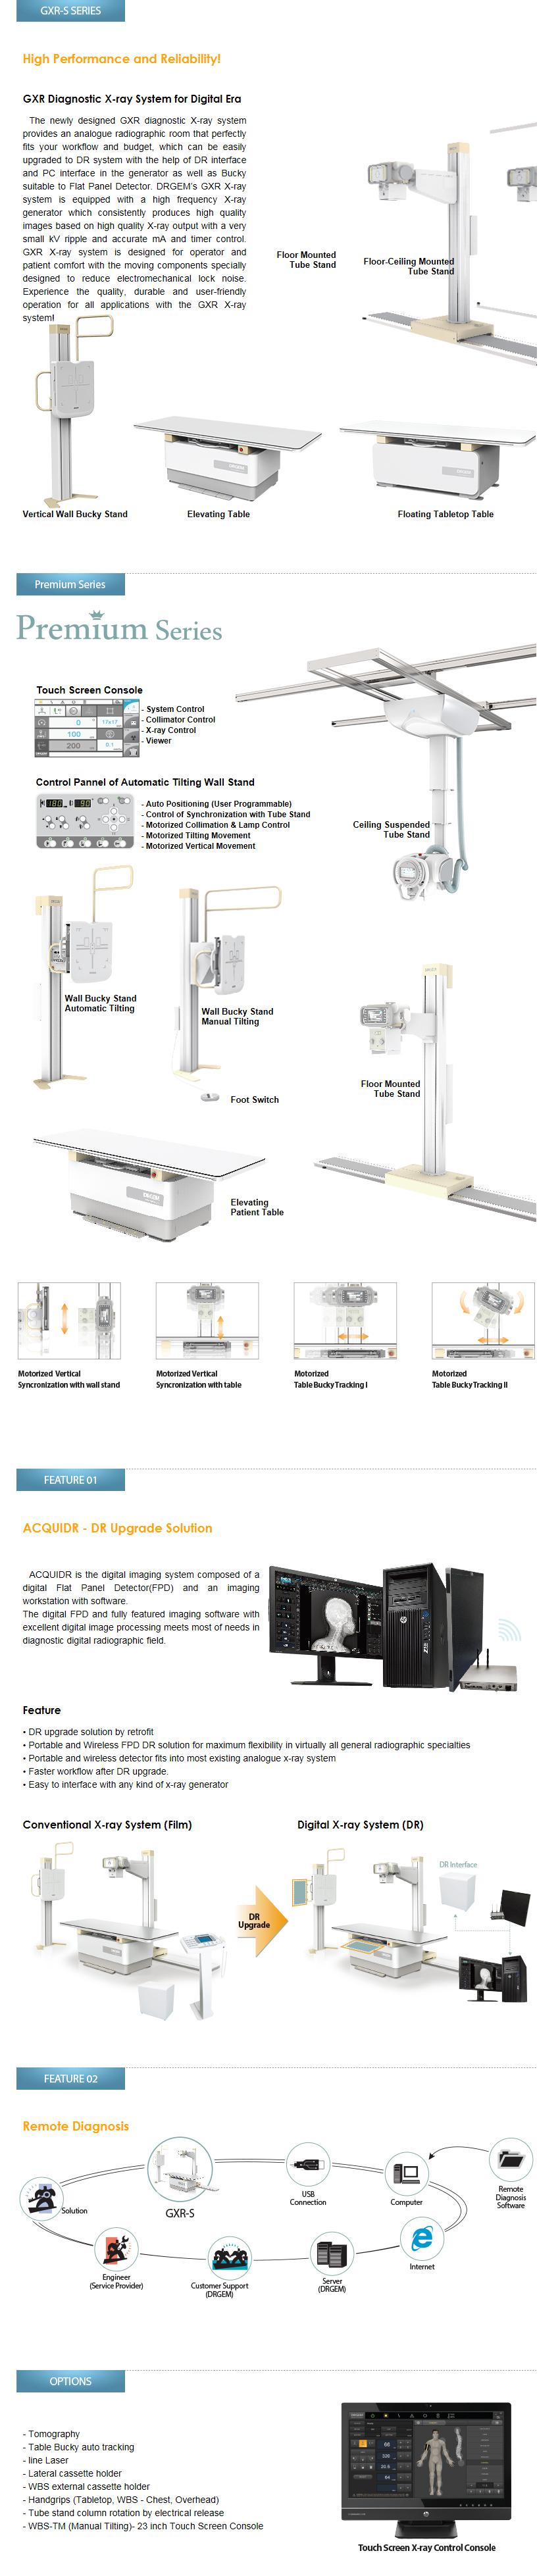 DRGEM Digital Radiography System GXR-S Series